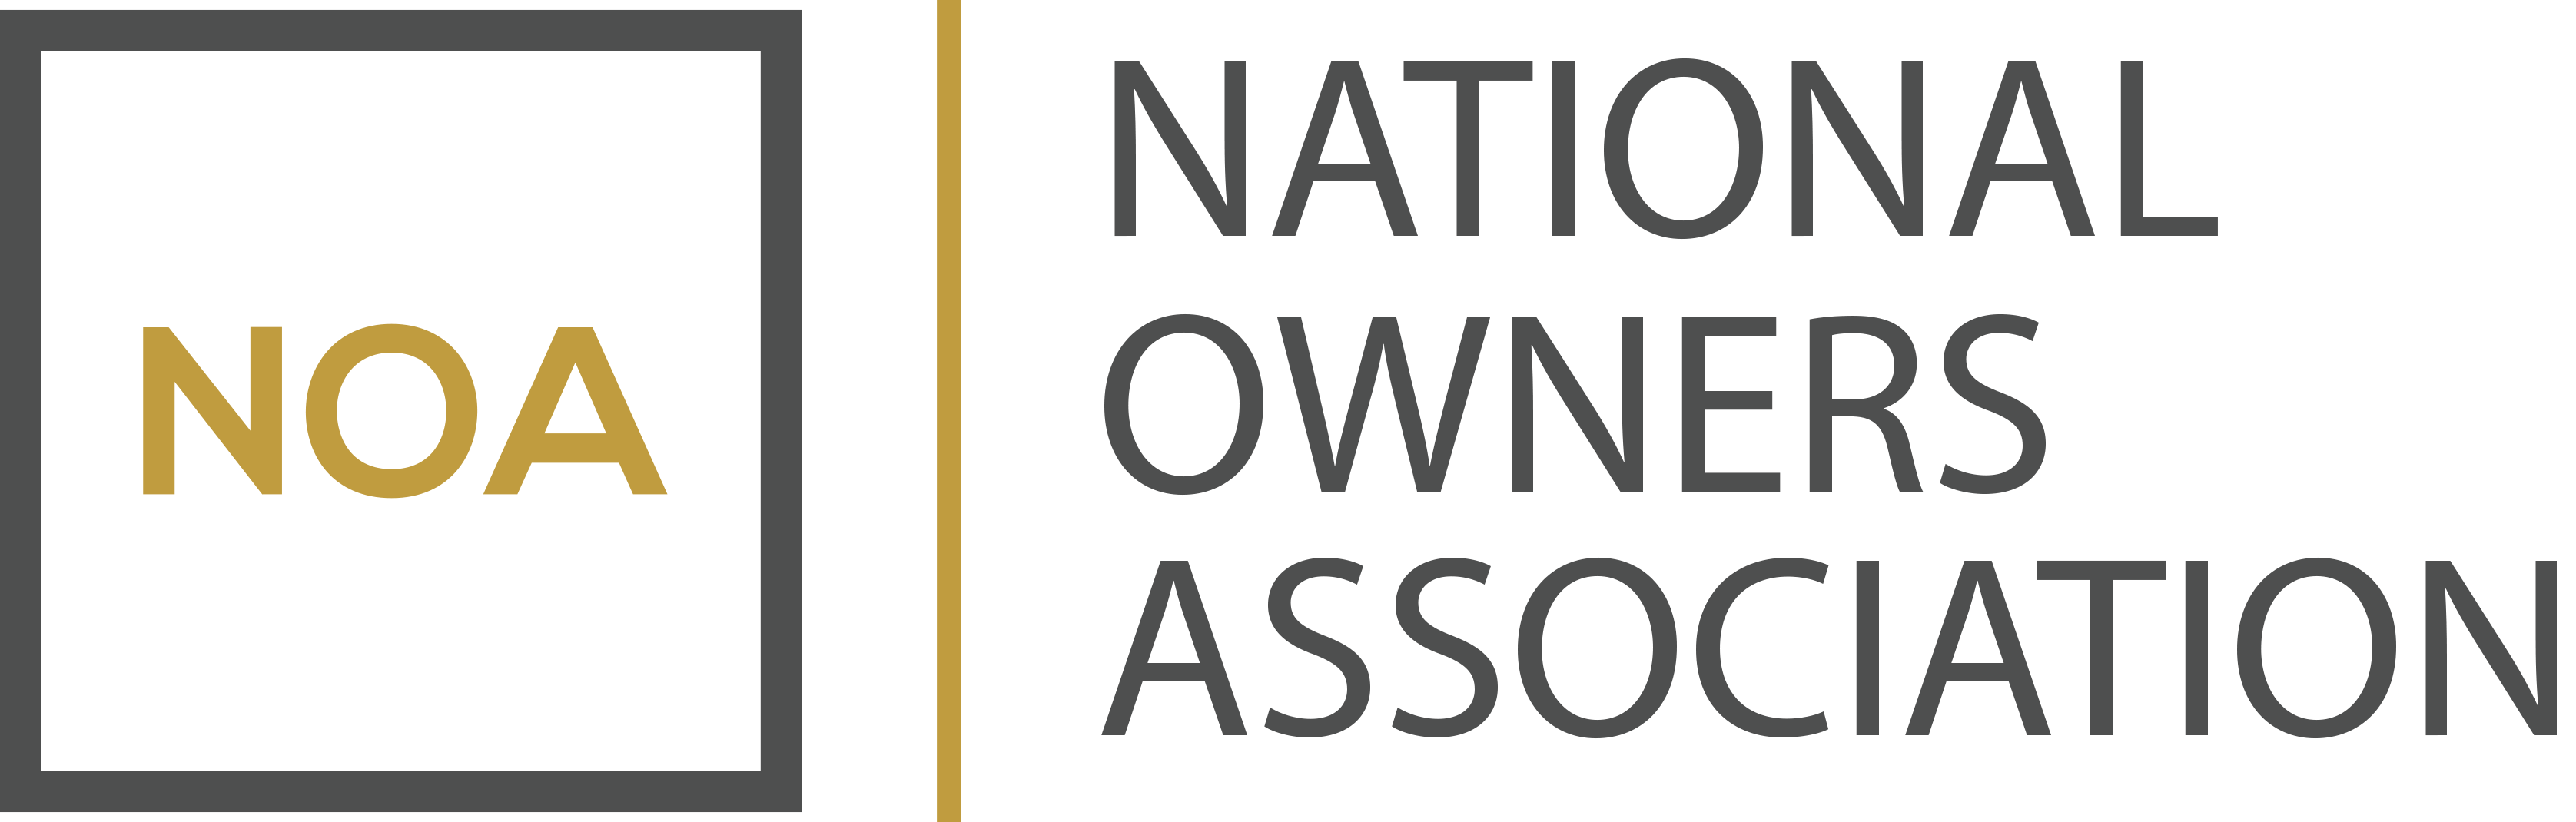 NOA_logo-grayandgold